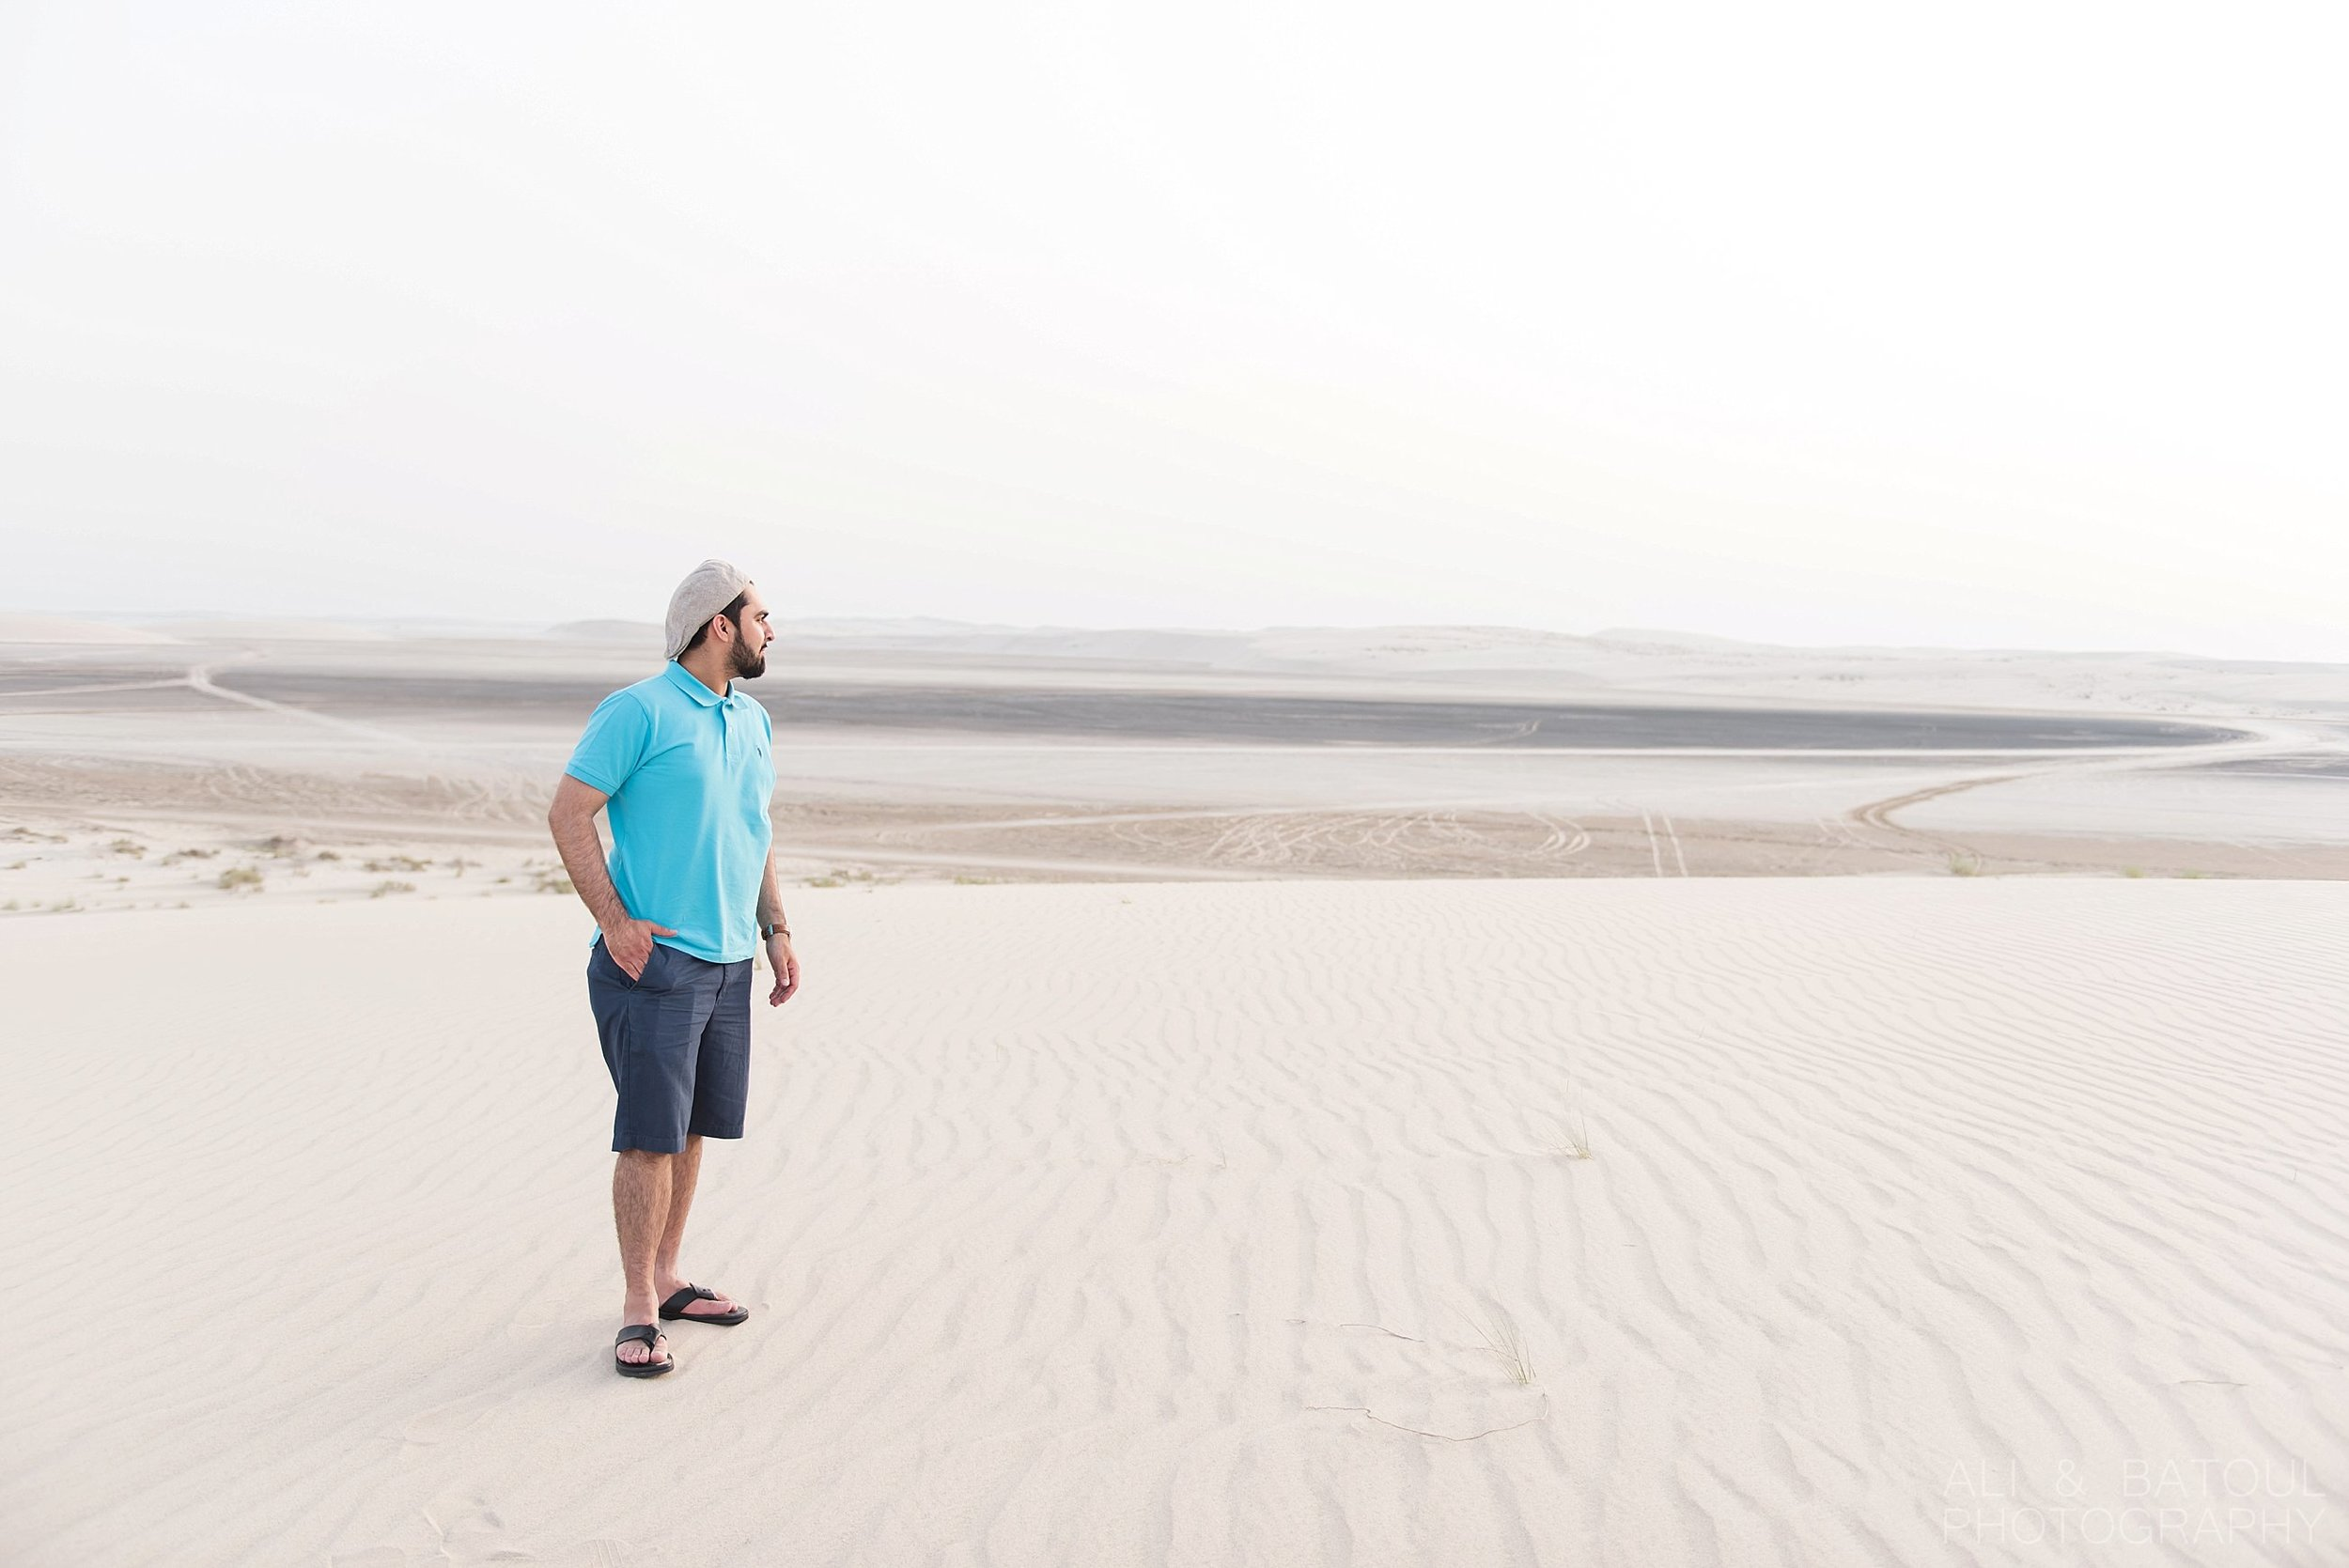 Ali & Batoul Photography - Doha Travel Photography_0077.jpg